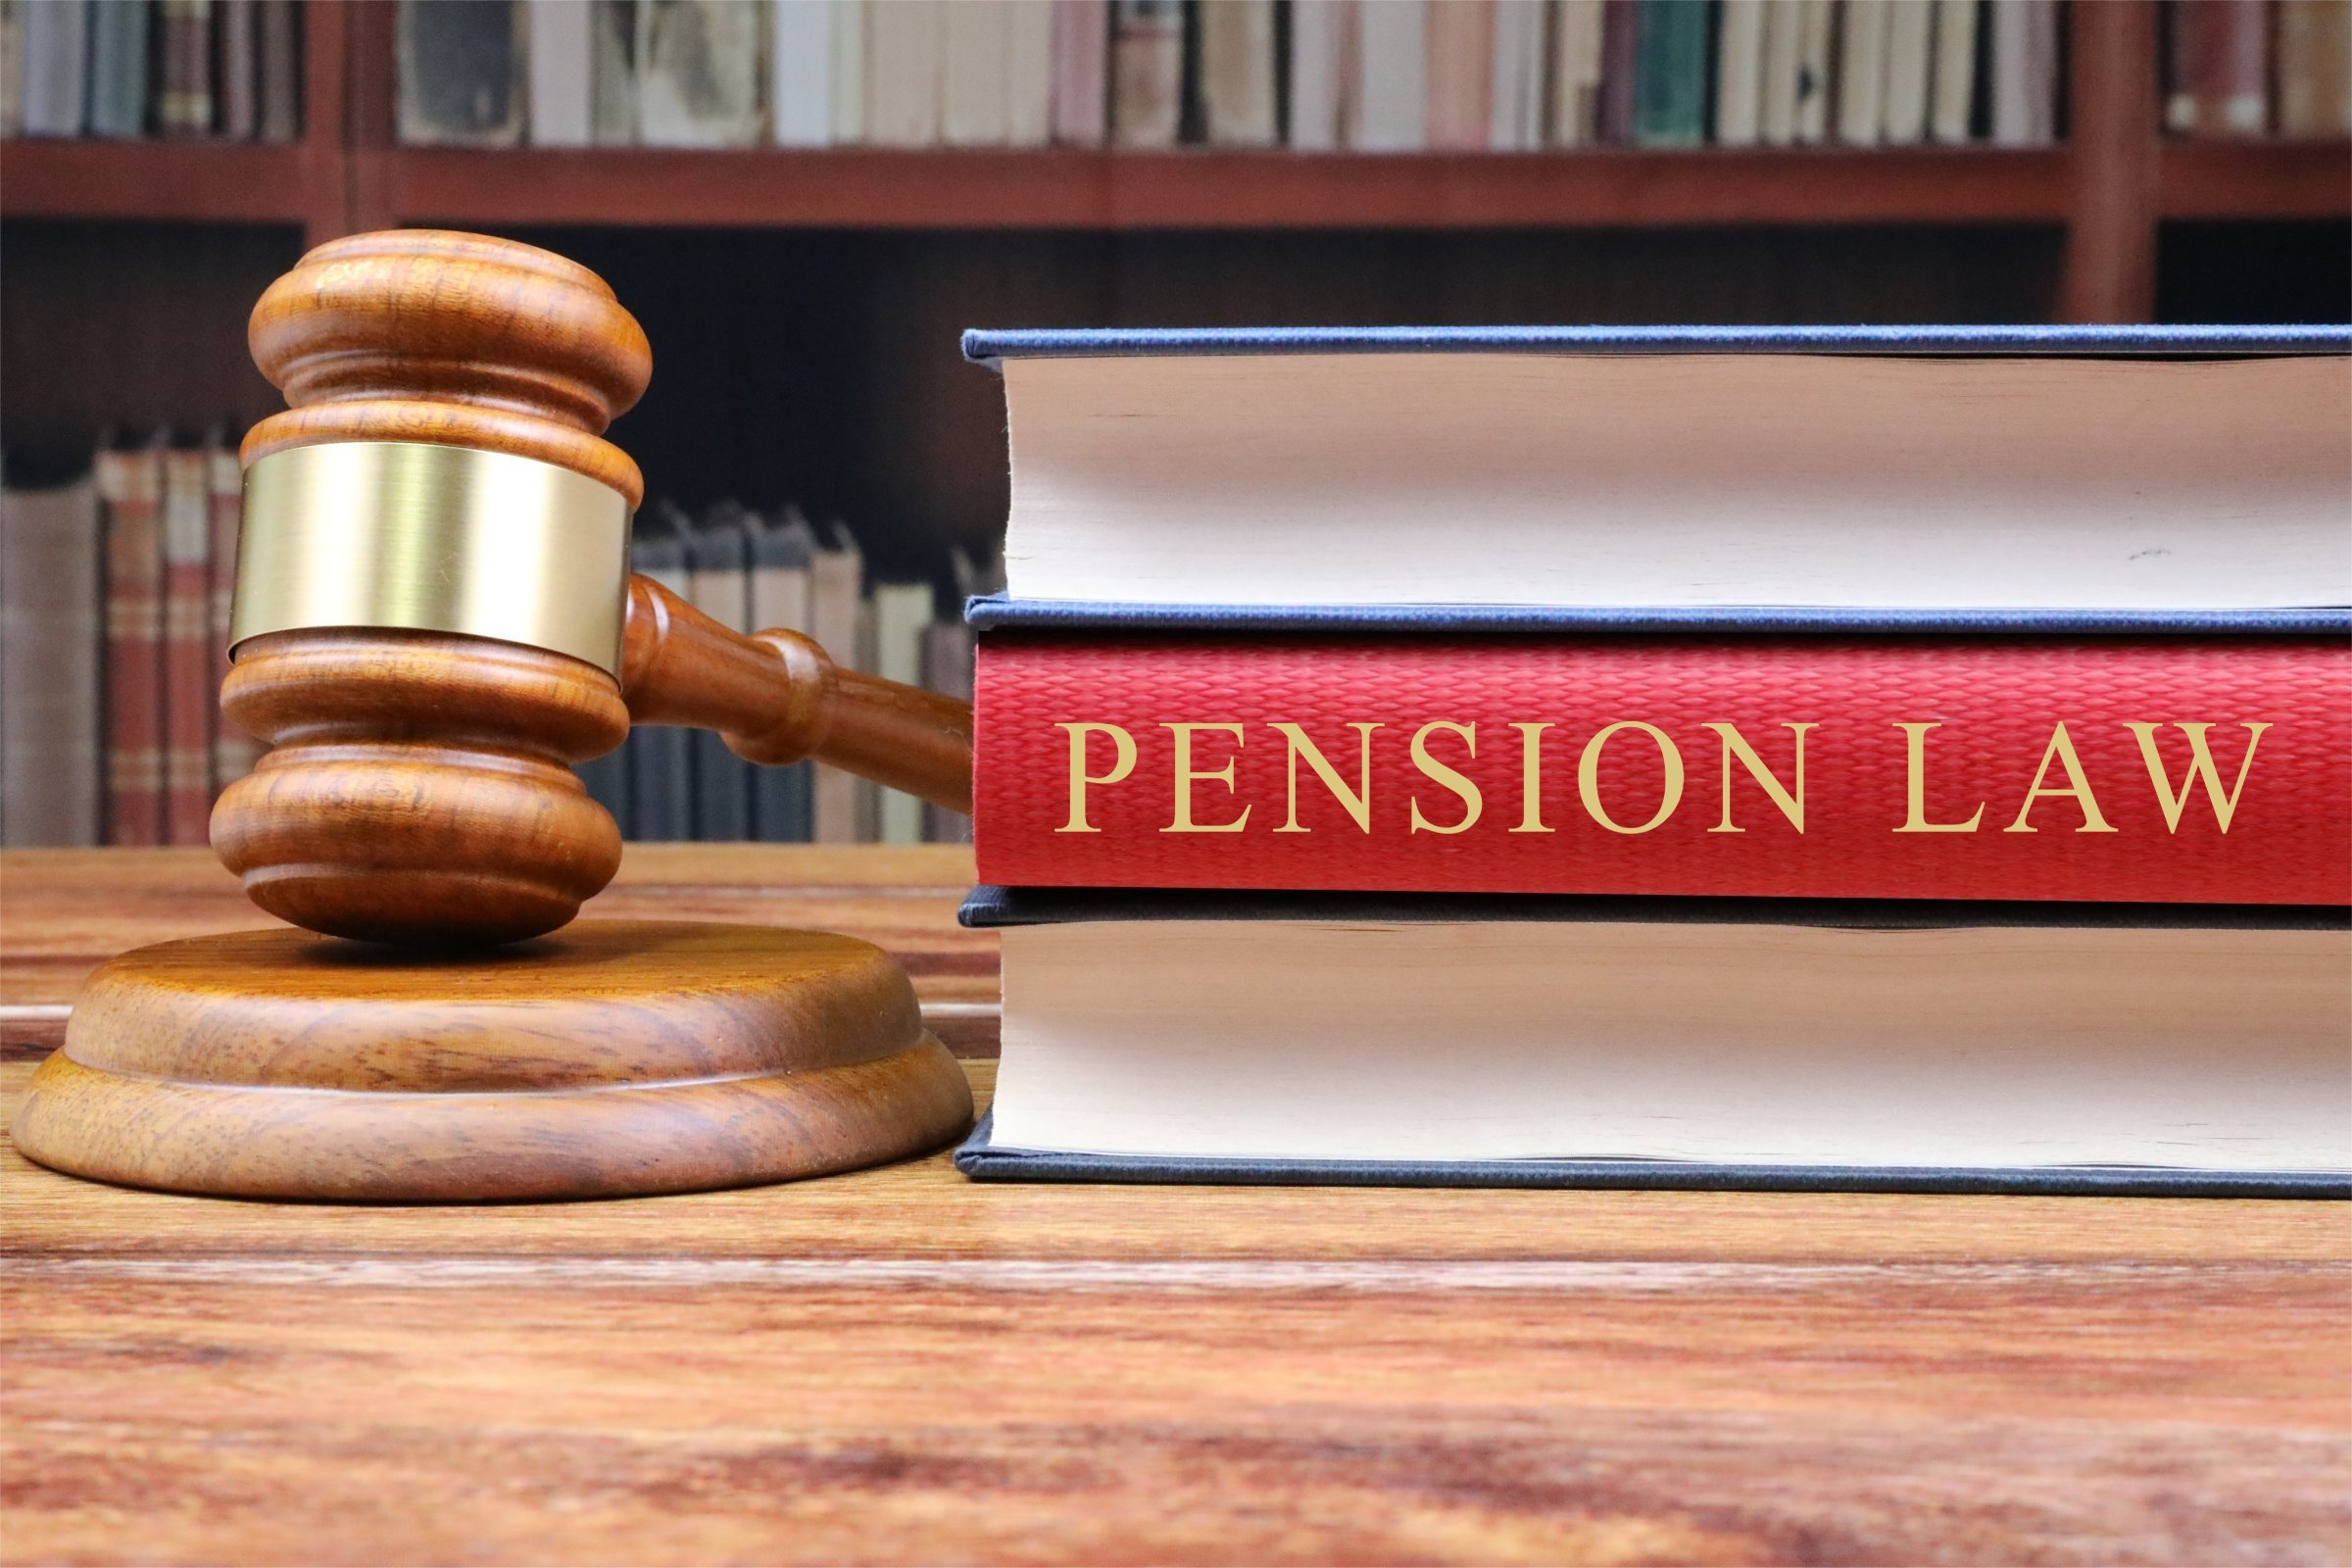 Pension Law